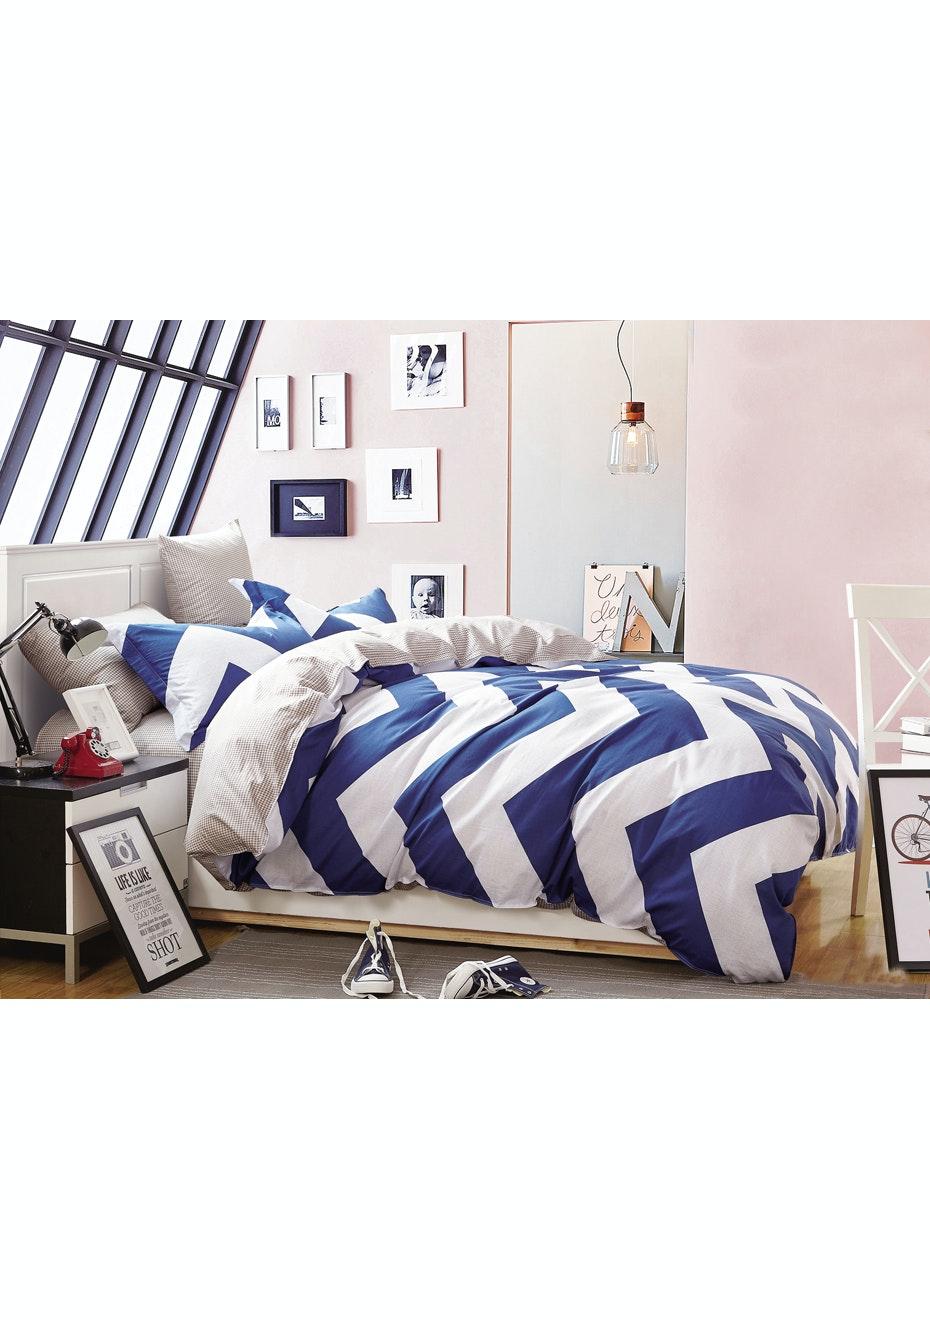 San Diego Quilt Cover Set - Reversible Design - 100% Cotton Double Bed